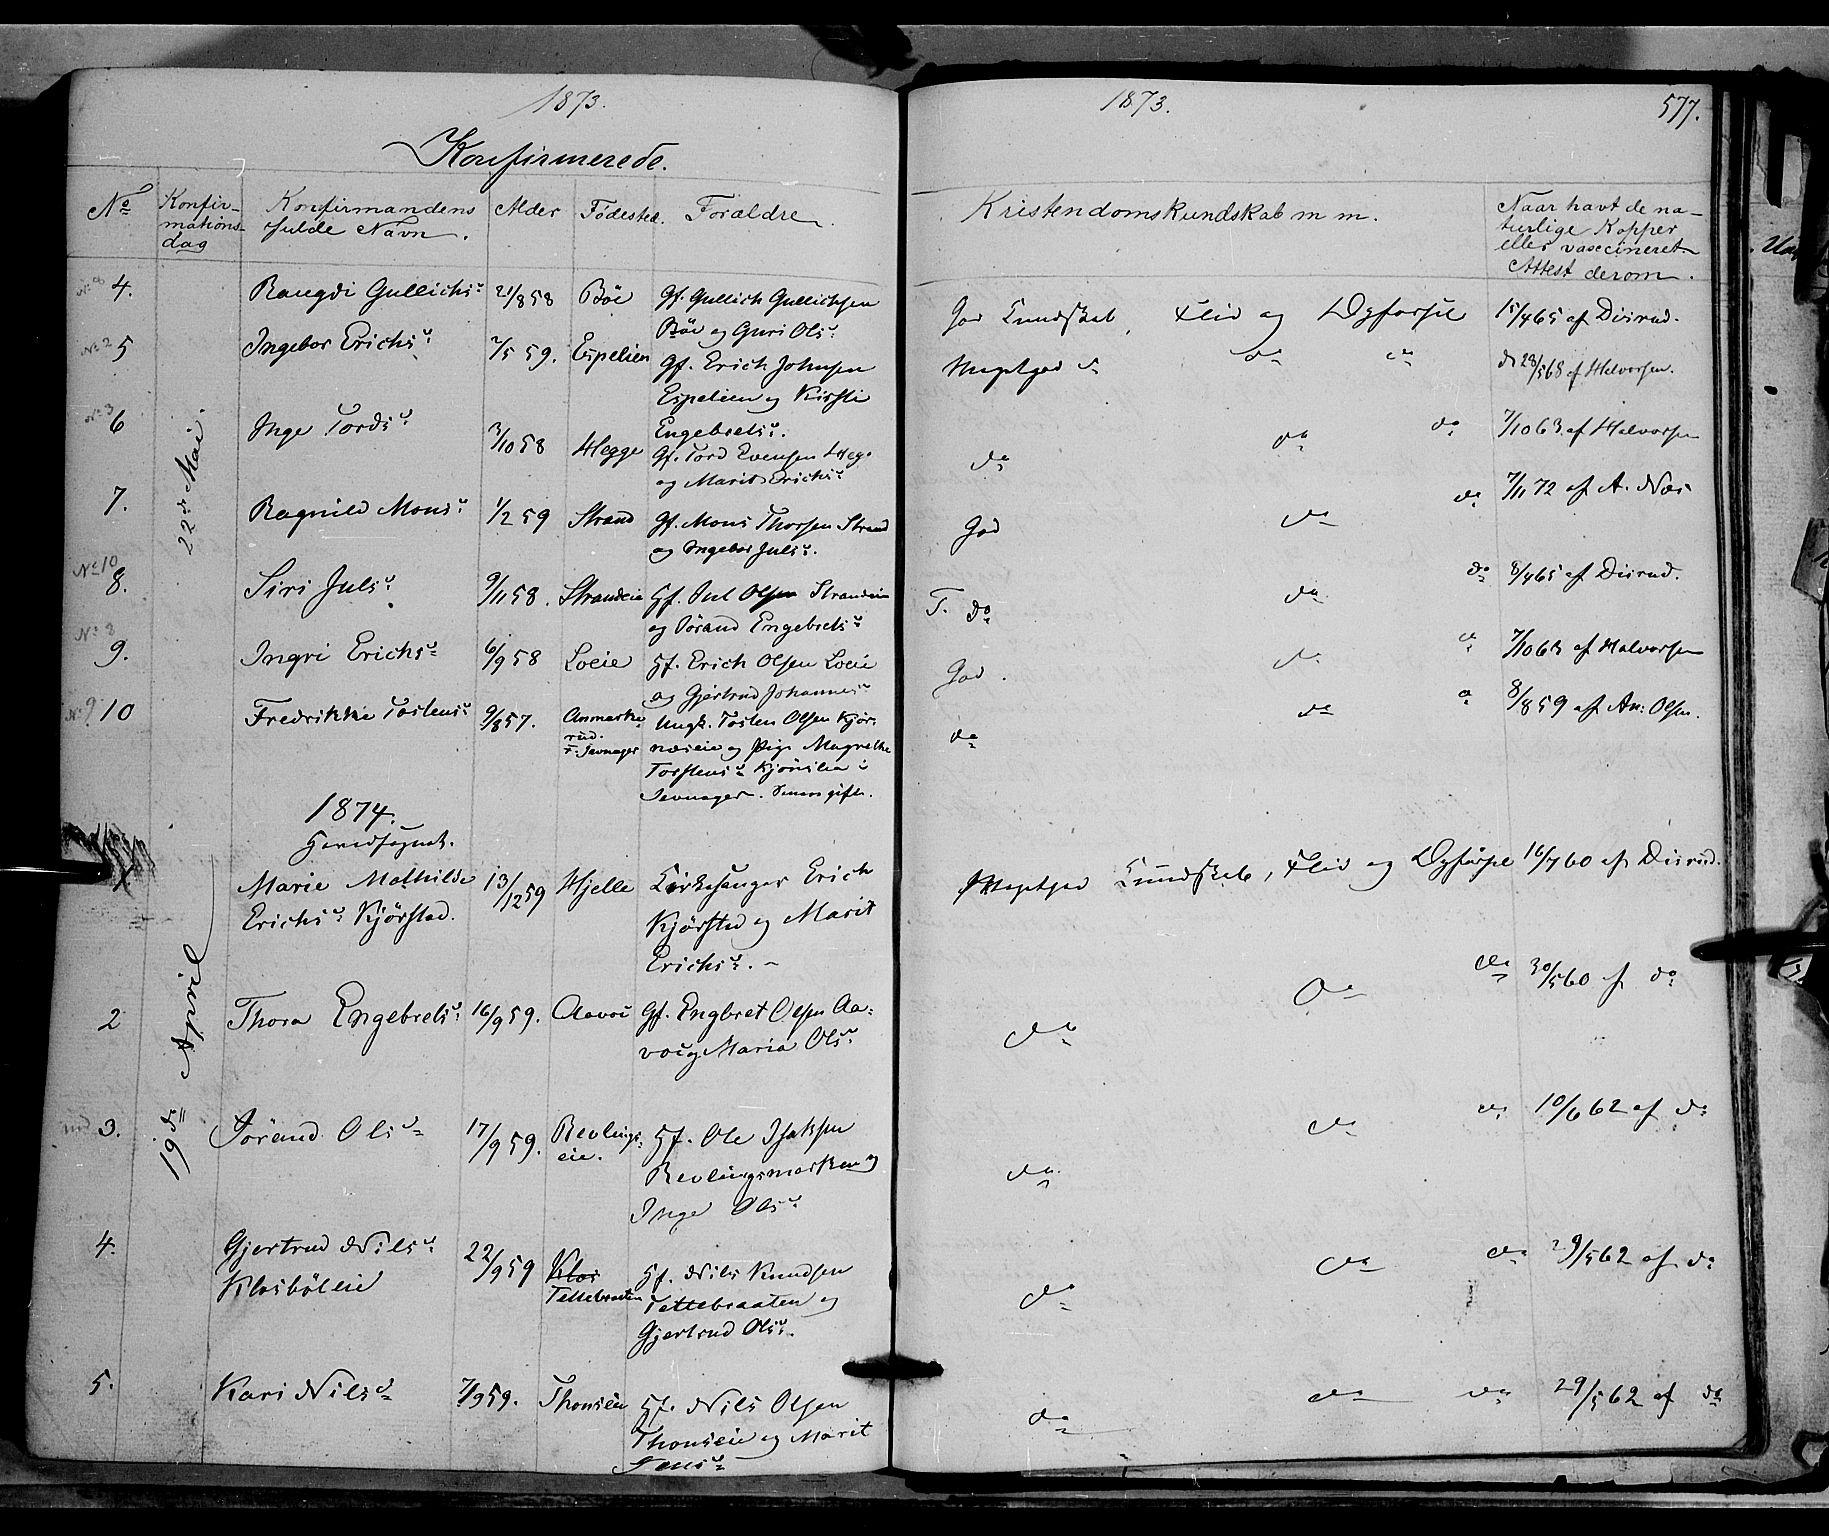 SAH, Nord-Aurdal prestekontor, Ministerialbok nr. 8, 1863-1875, s. 577